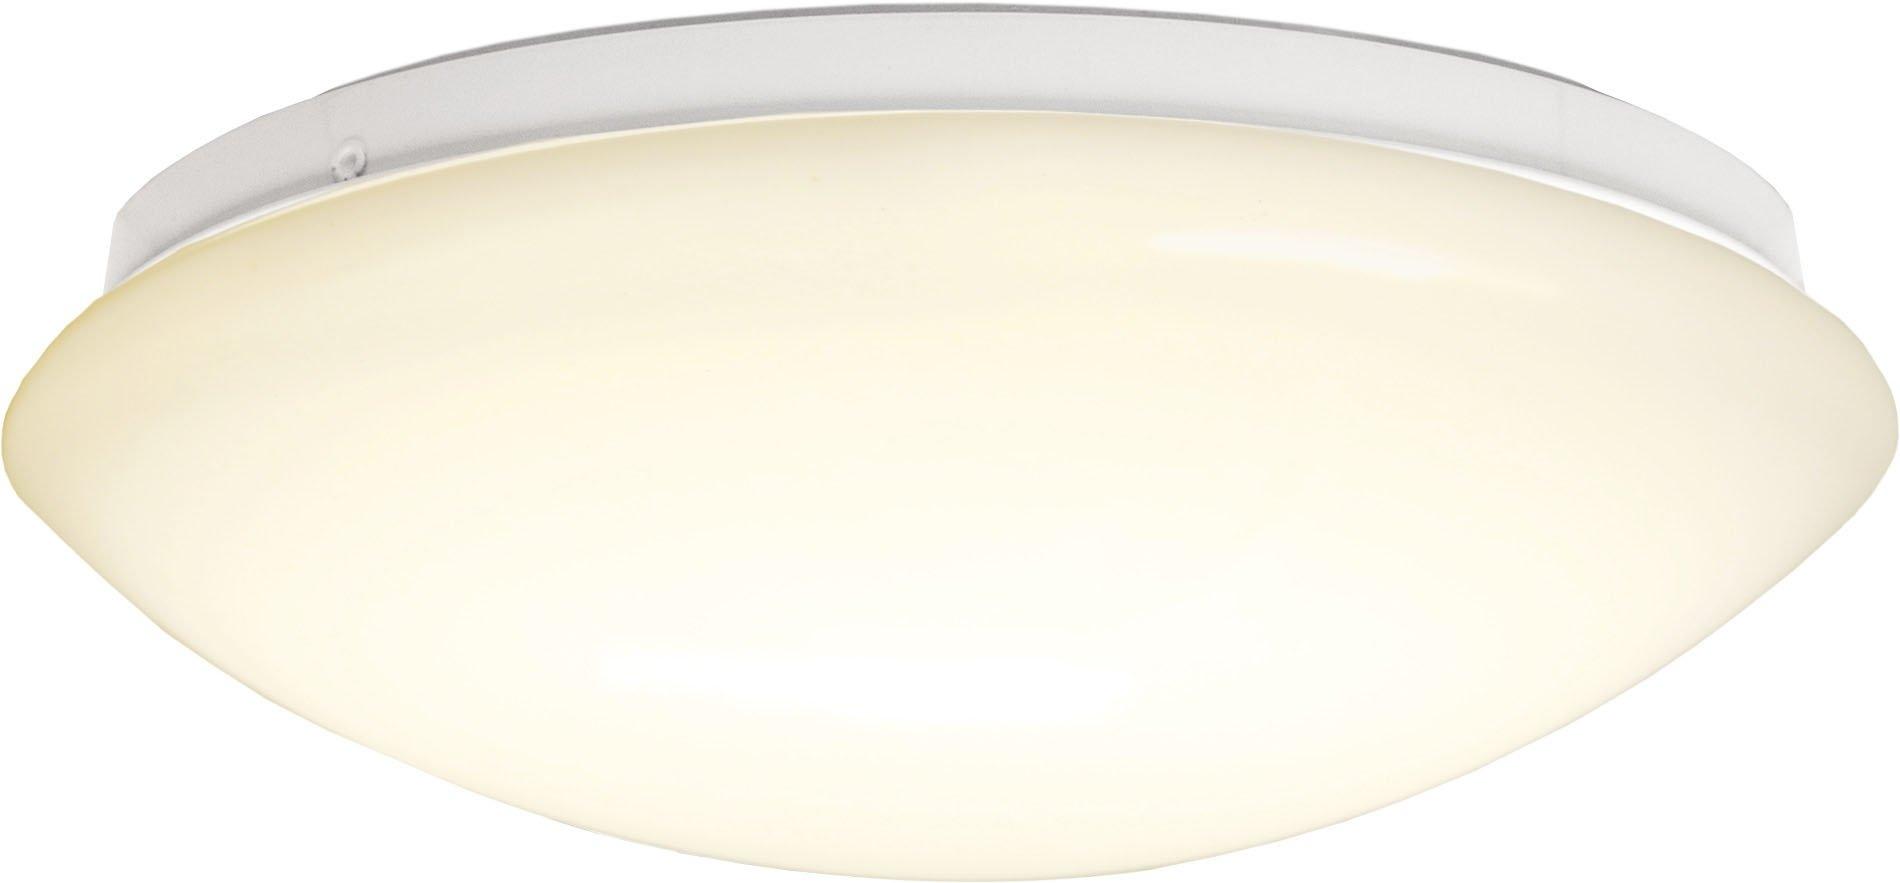 STAR TRADING led-plafondlamp Integra Ceiling online kopen op otto.nl